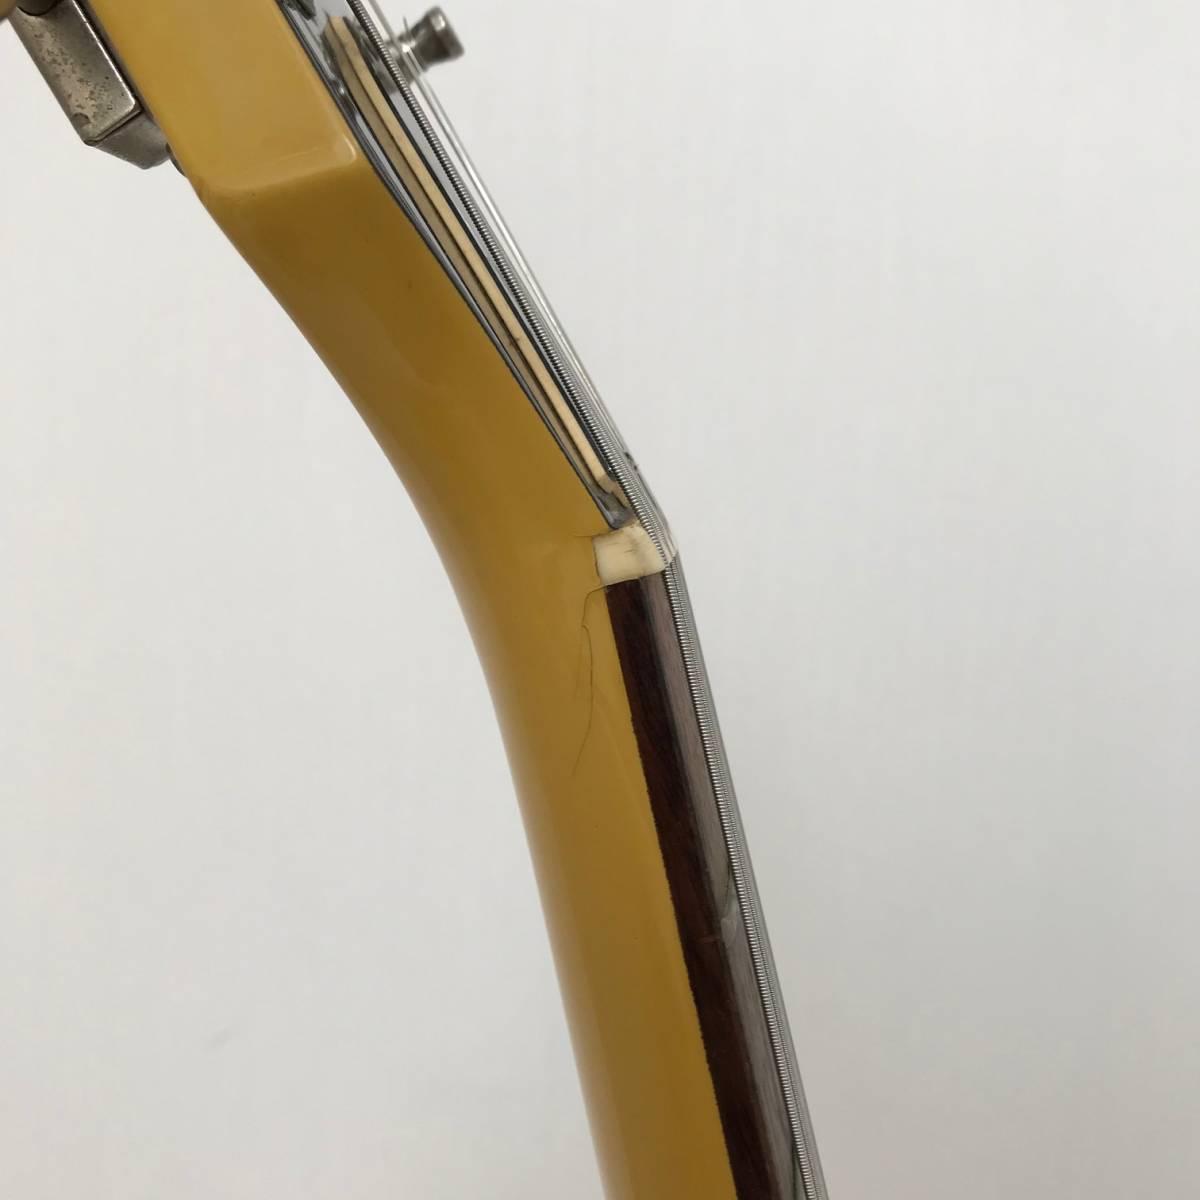 Orville by Gibson Les Paul Junior オービル バイ ギブソン レスポールジュニア イエロー 重量3.6kg_画像9